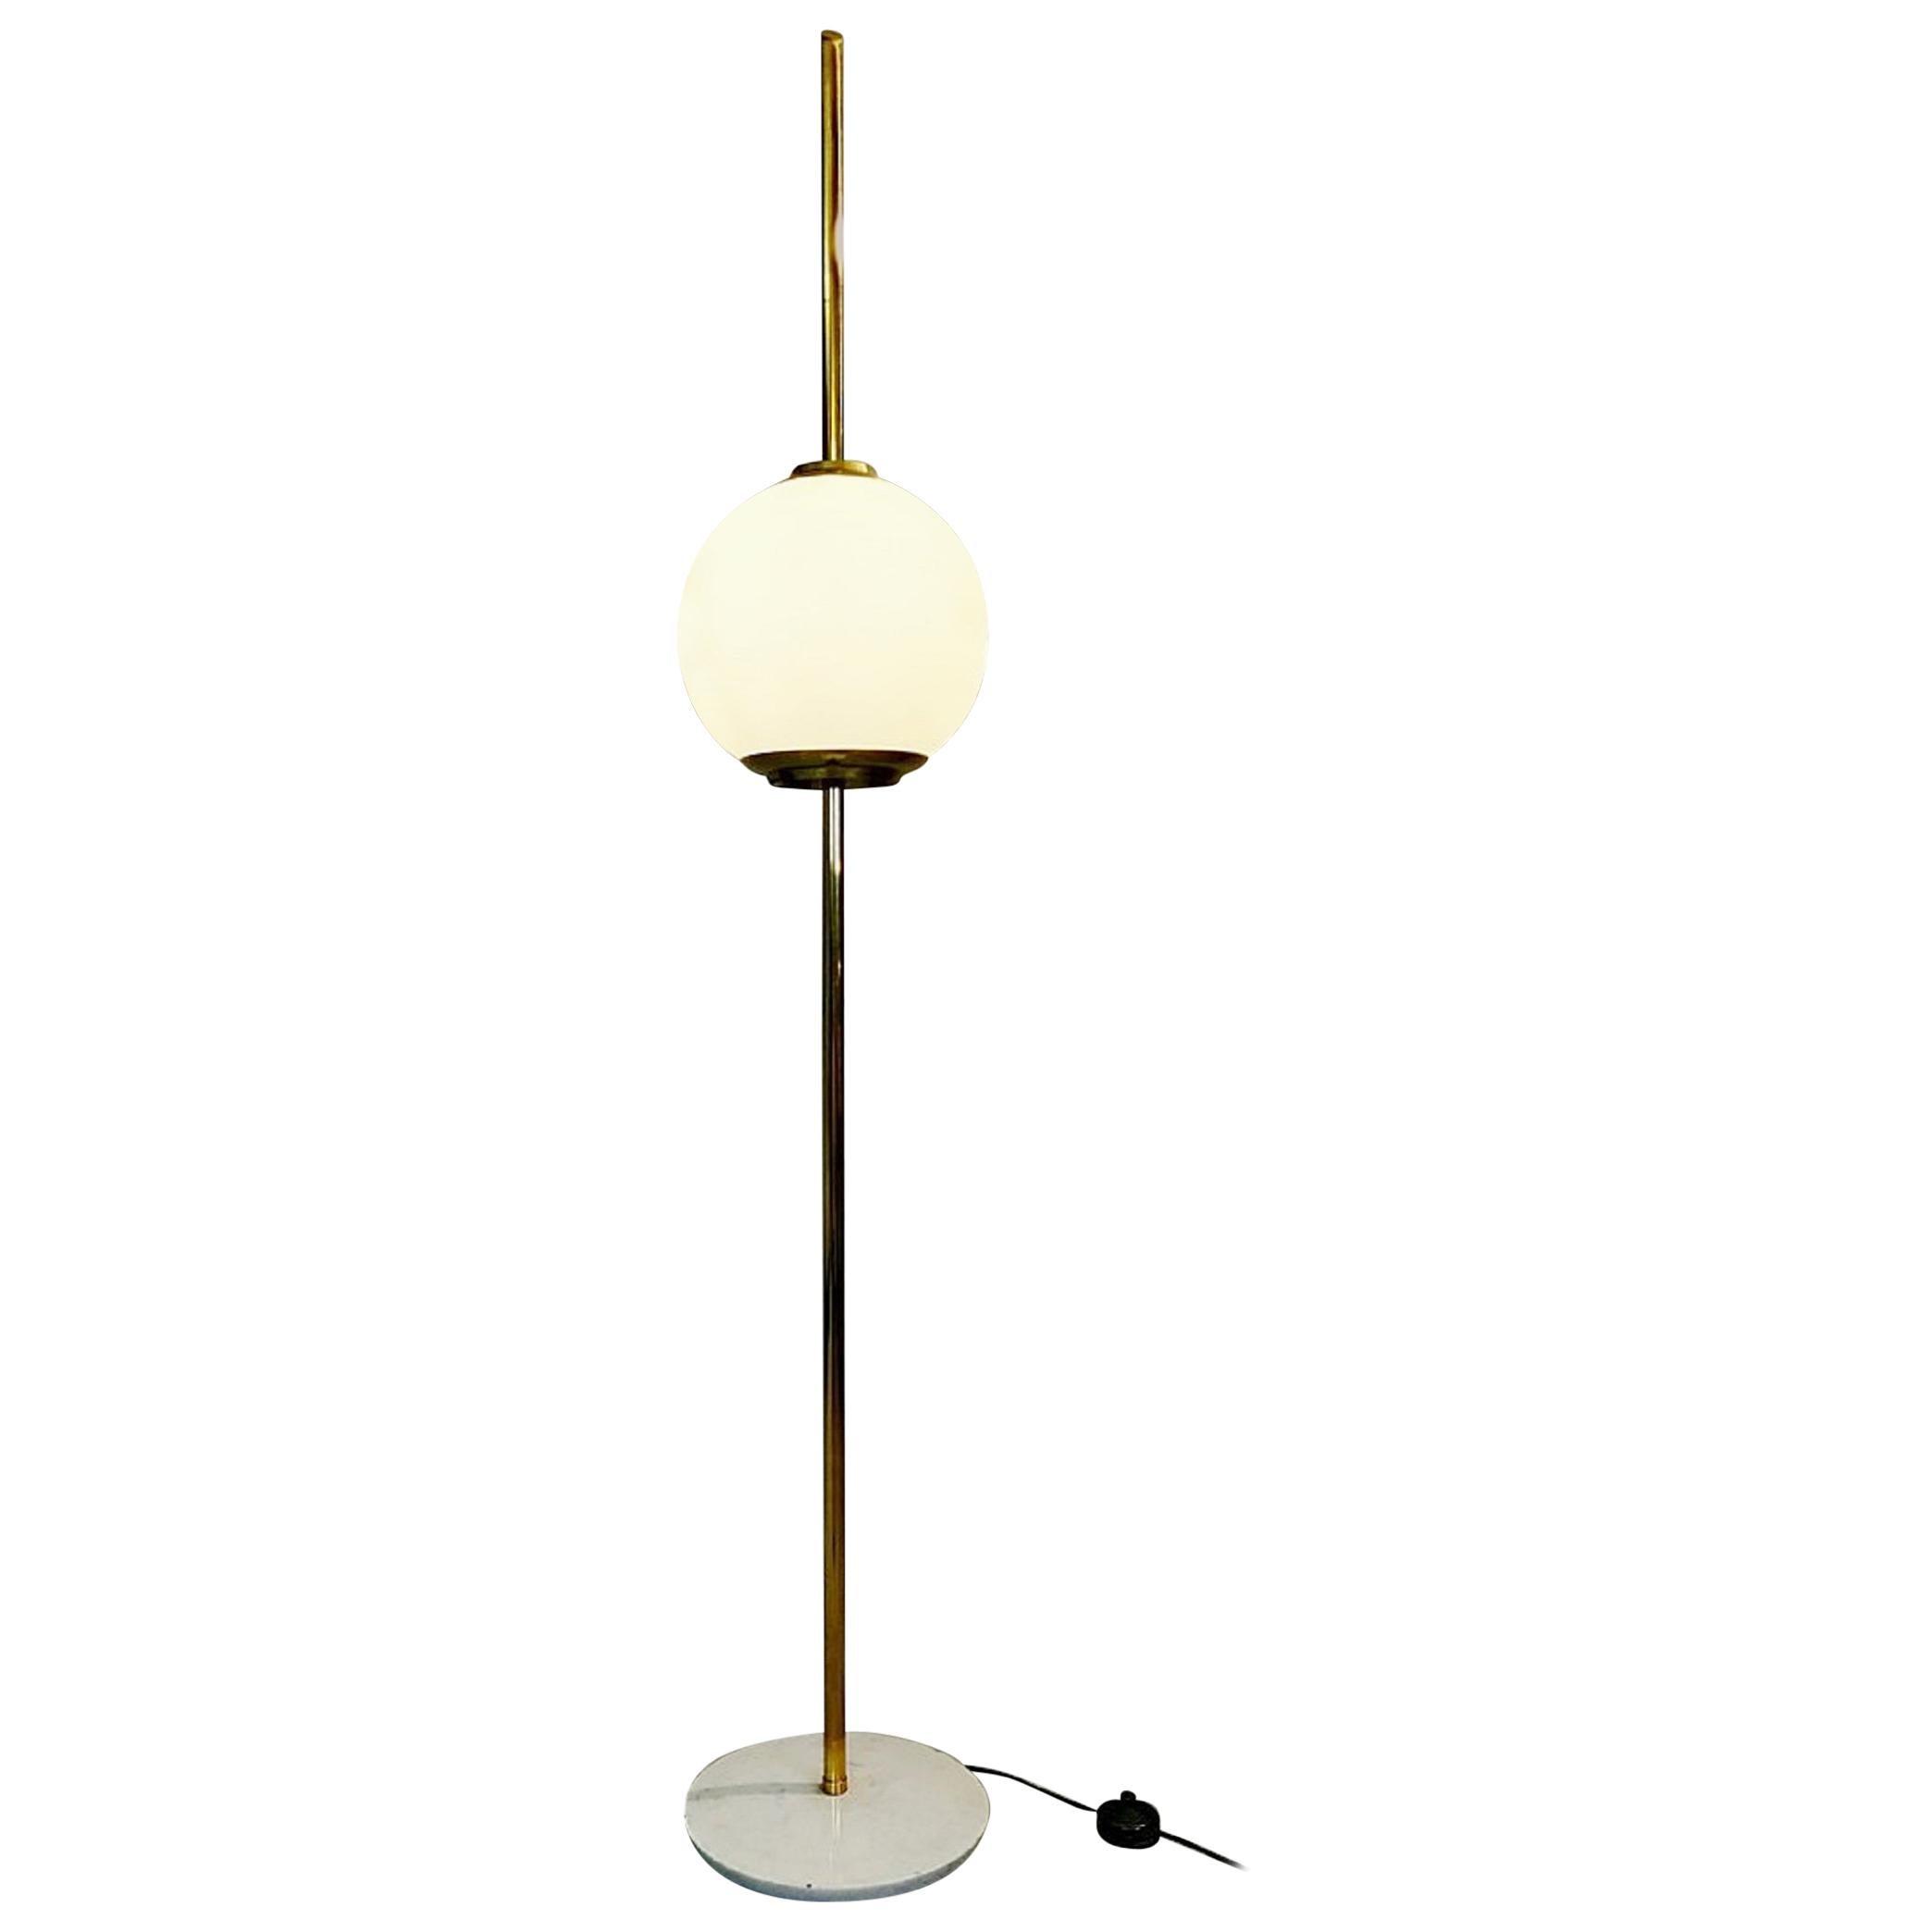 Brass and Marble Italian Floor Lamp, 1960s